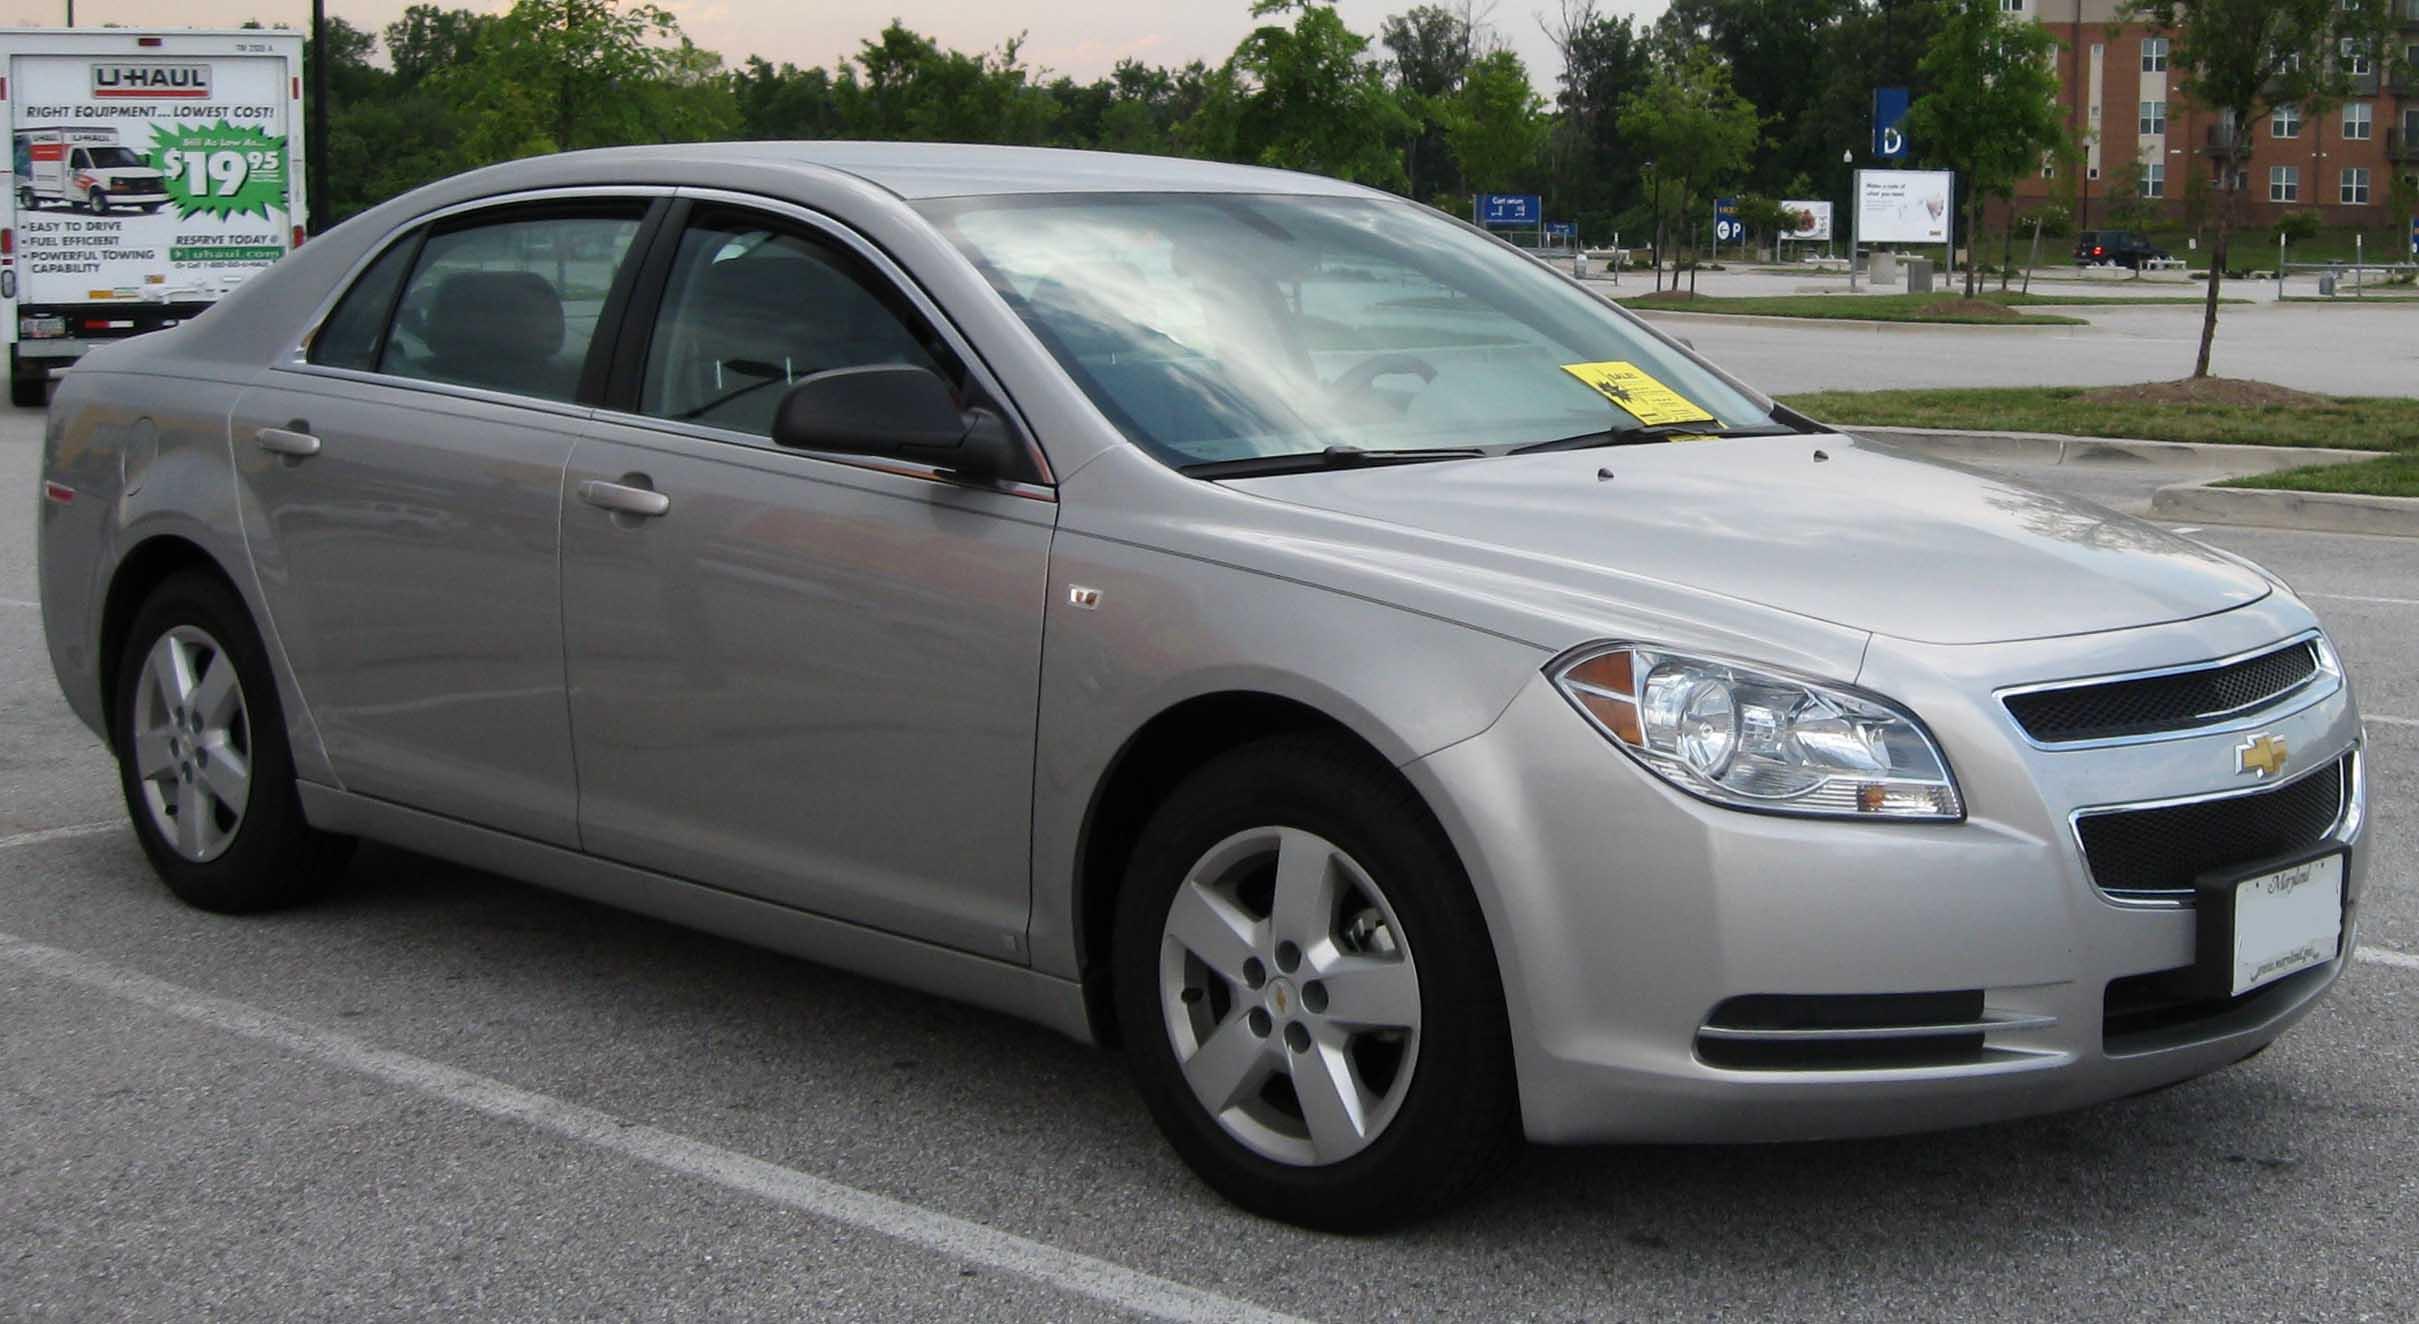 File:2008 Chevrolet Malibu LS.jpg - Wikipedia, the free encyclopedia